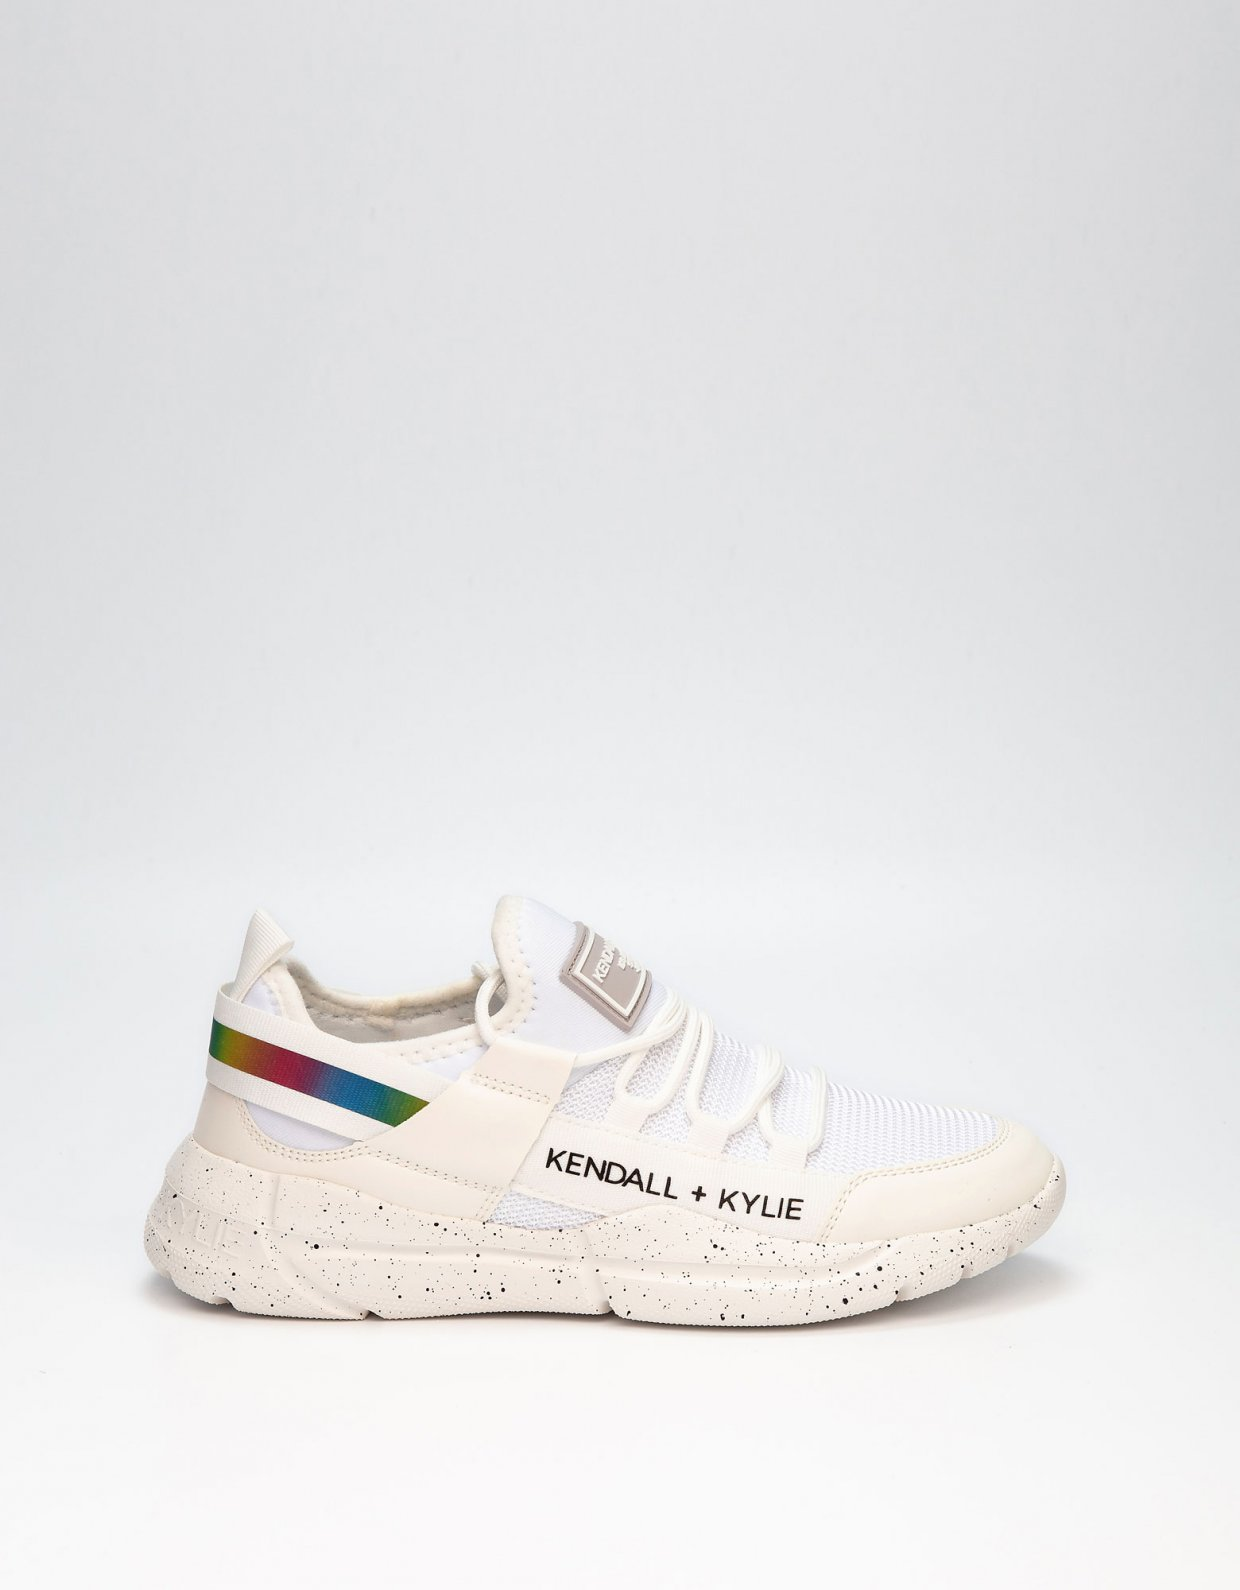 Kendall + Kylie KK Neci sneakers white